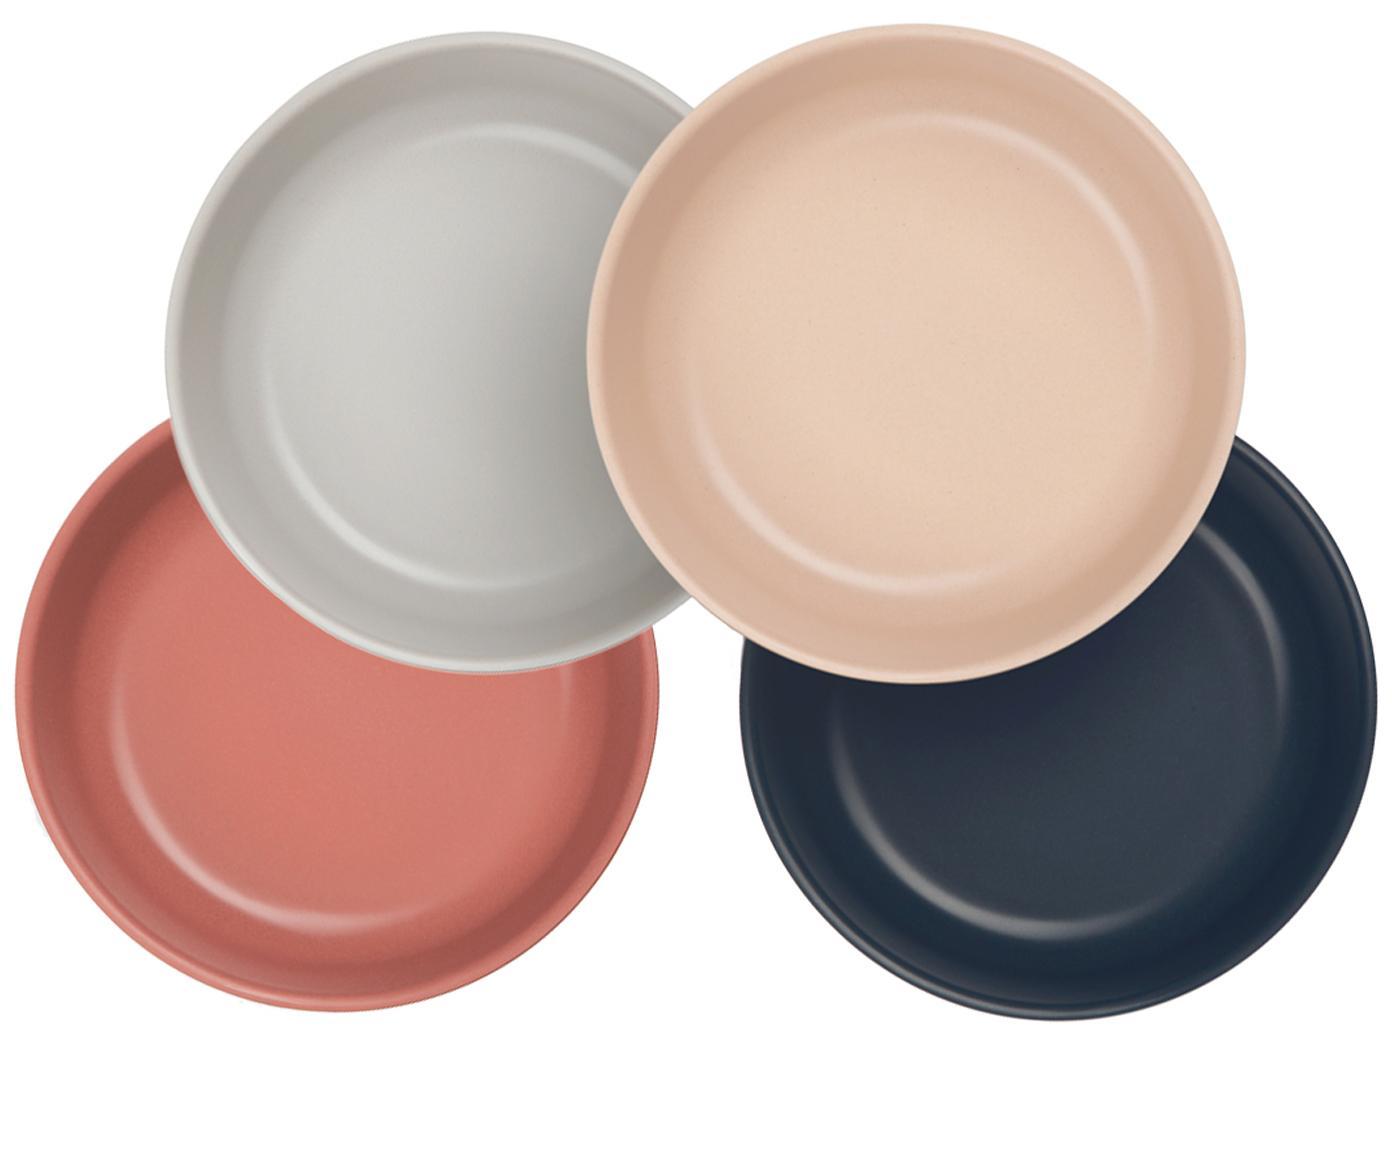 Set de cuencos Bambino, 4pzas., Fibras de bambú, melamina, apto para alimentos Libre de BPA, PVC y ftalatos, Salmón, gris claro, gris, rojo terracota, Ø 15 x Al 5 cm